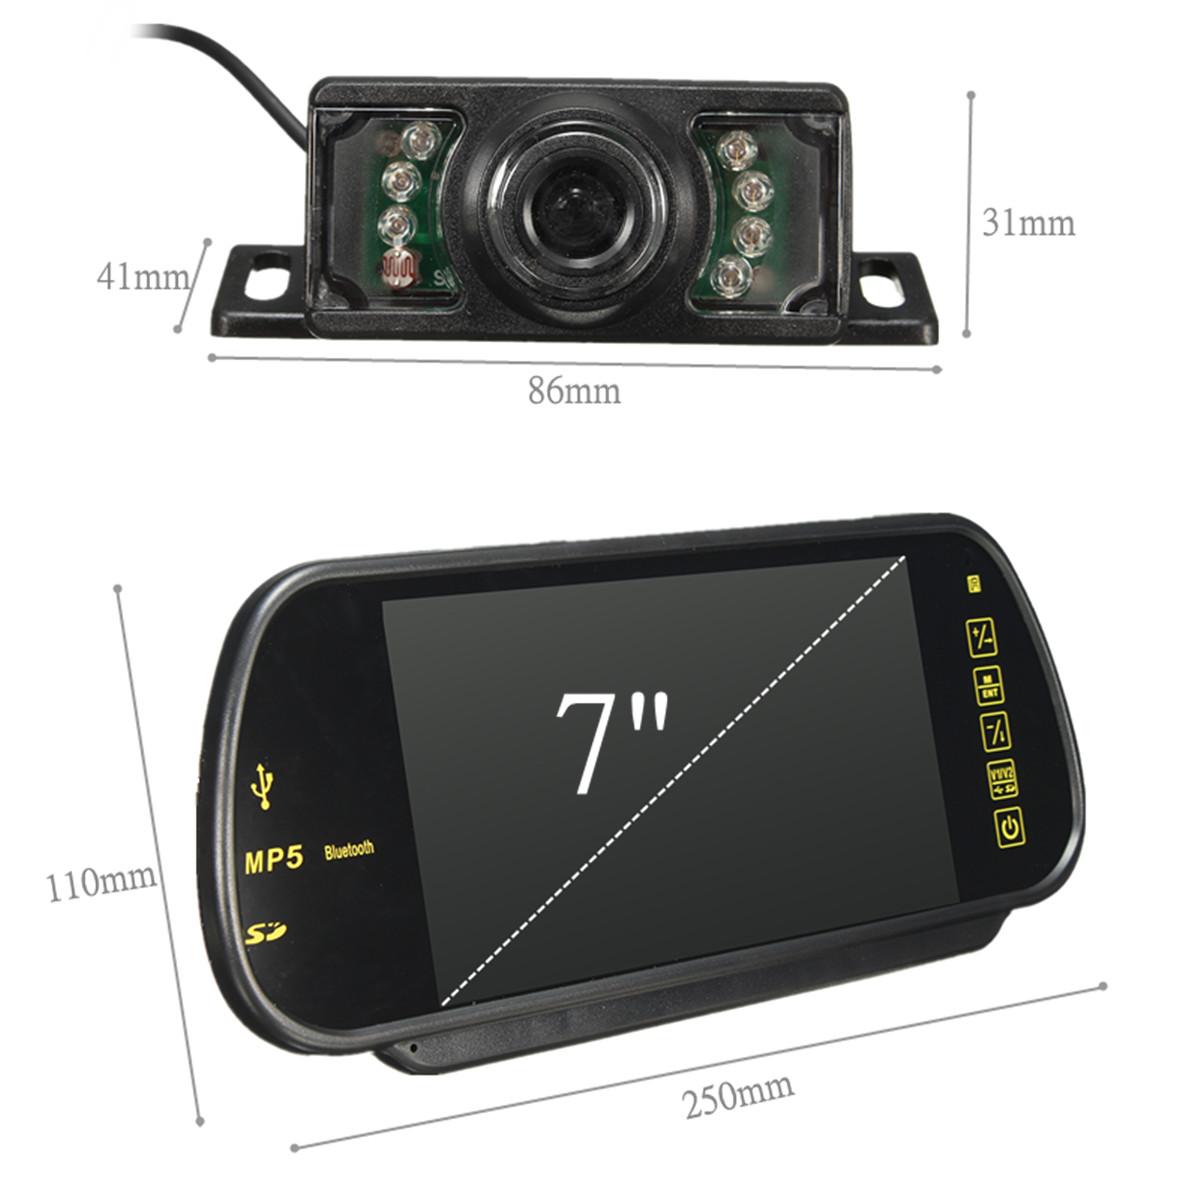 7 Inch LCD Mp5 bluetooth Reversing Camera Car Rear View Parking Mirror Monitor